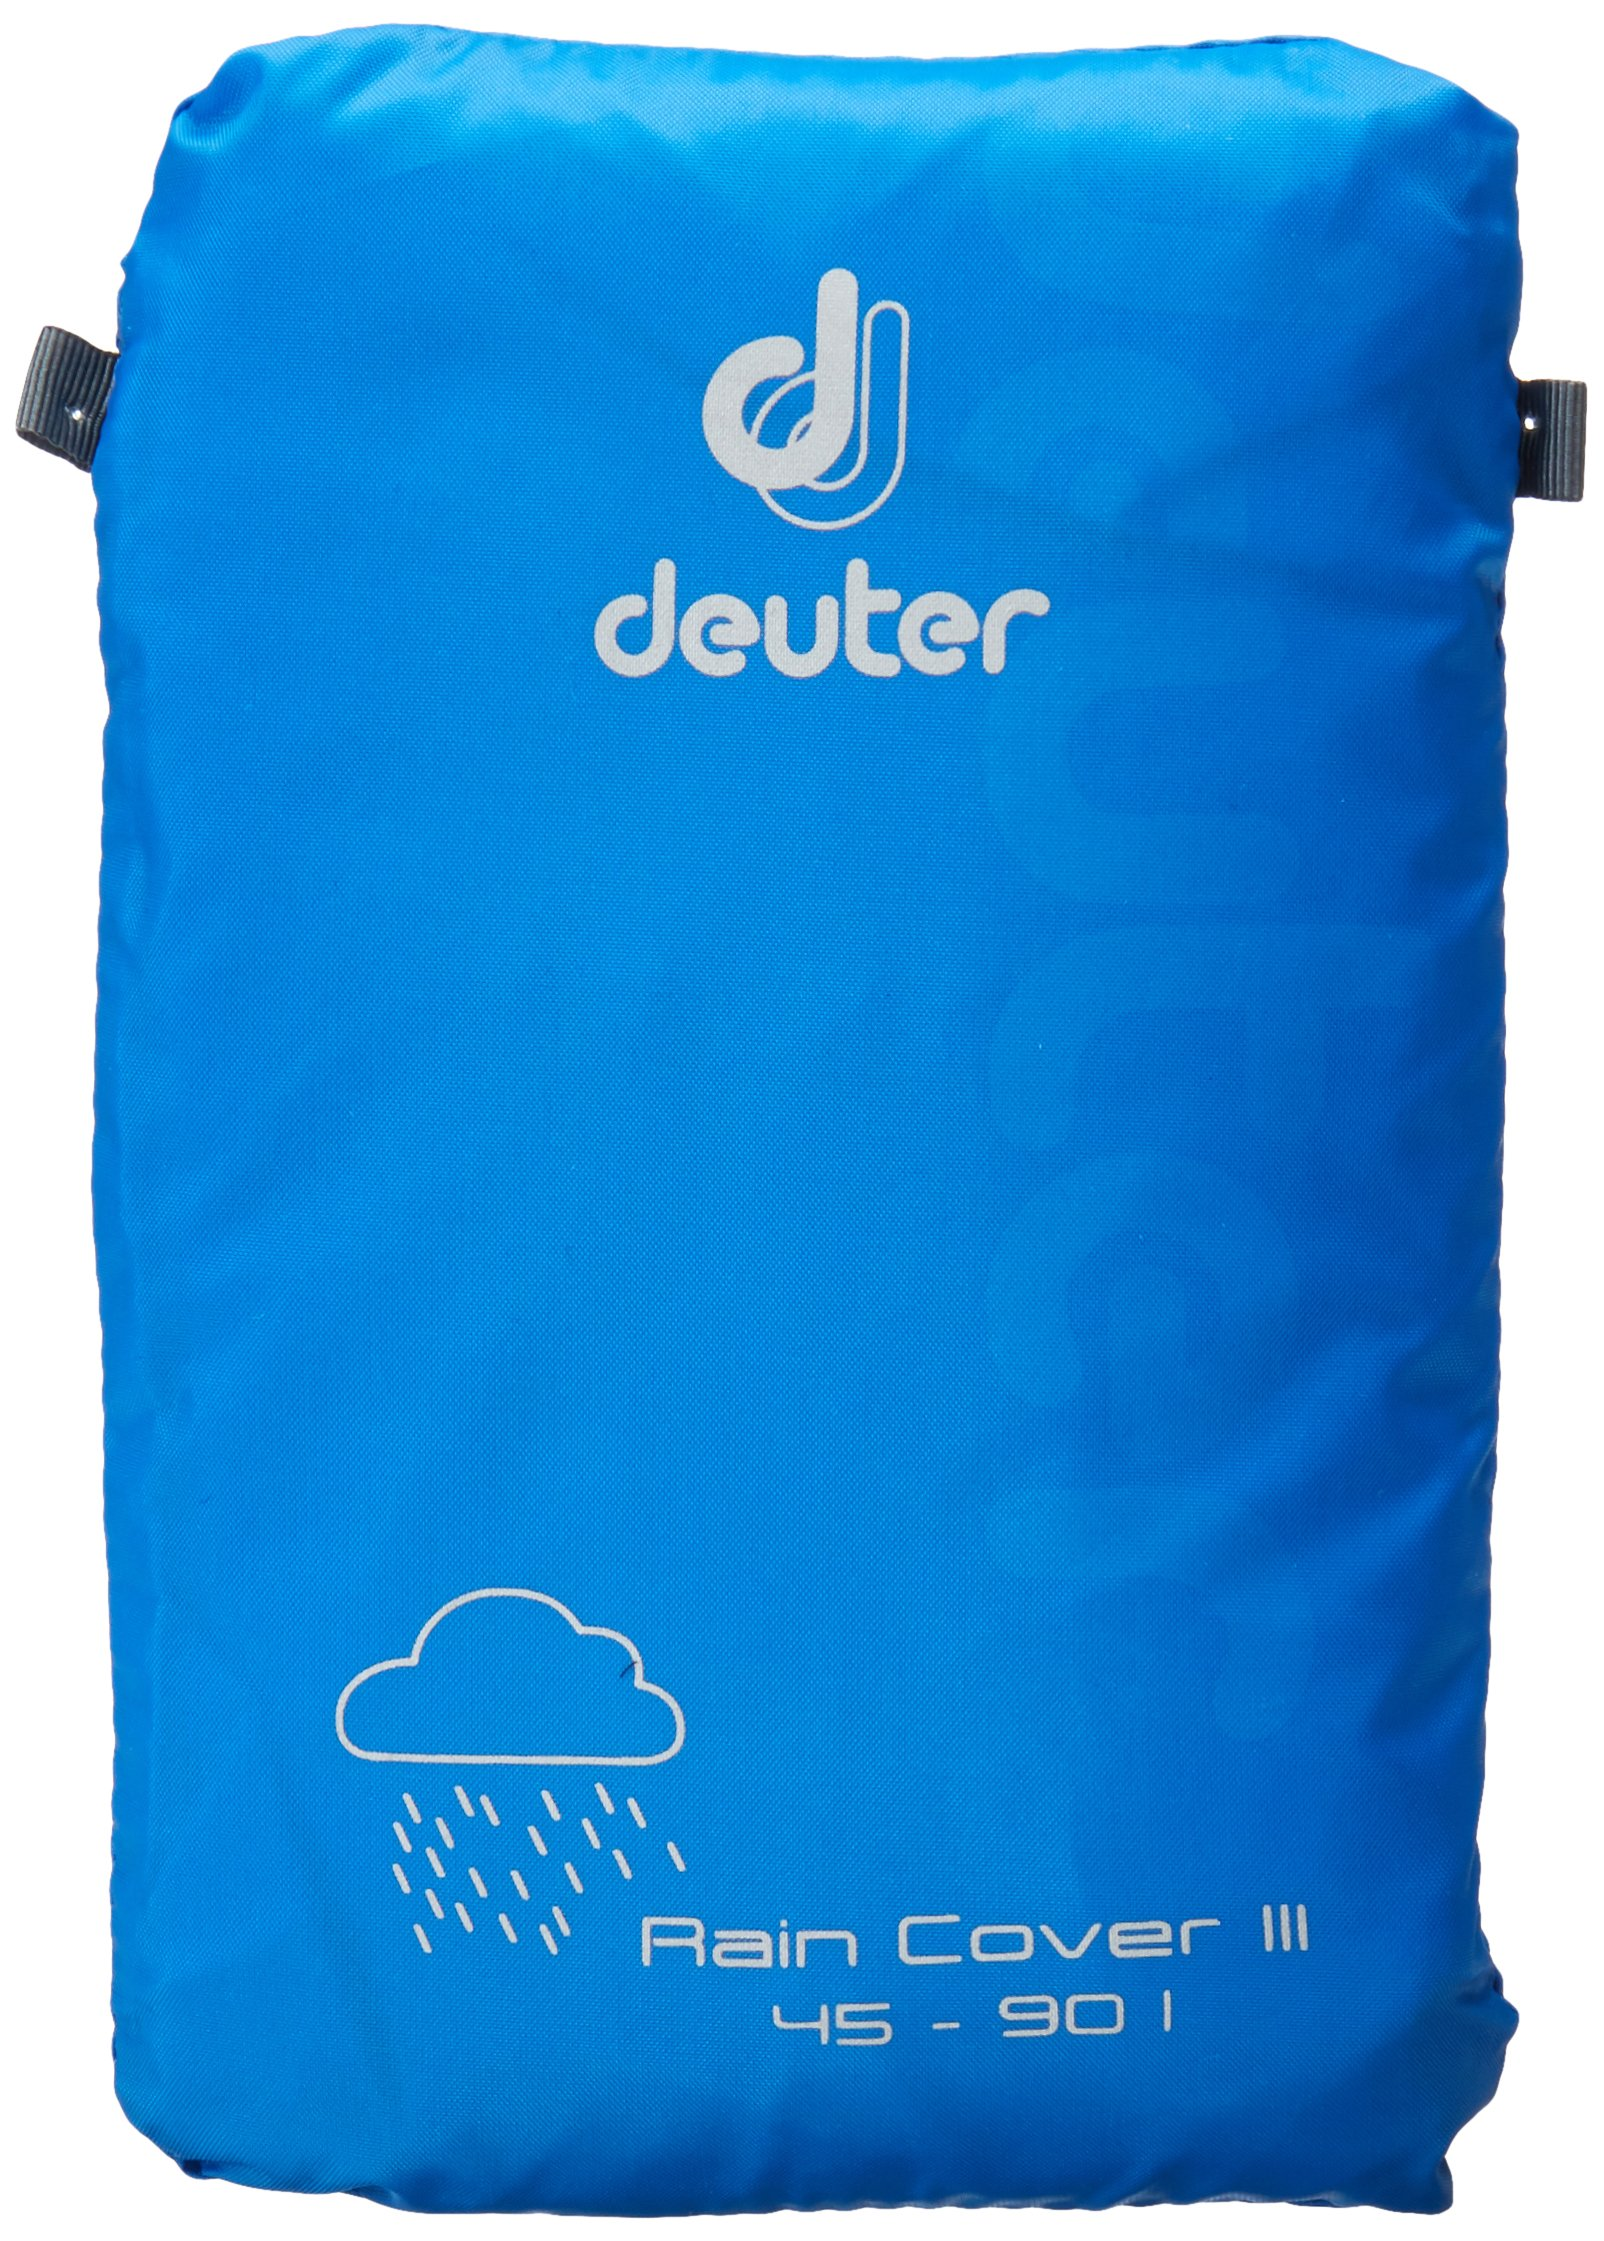 91QSPTyDIuL - Deuter Raincover Iii Rain and Transport Cover